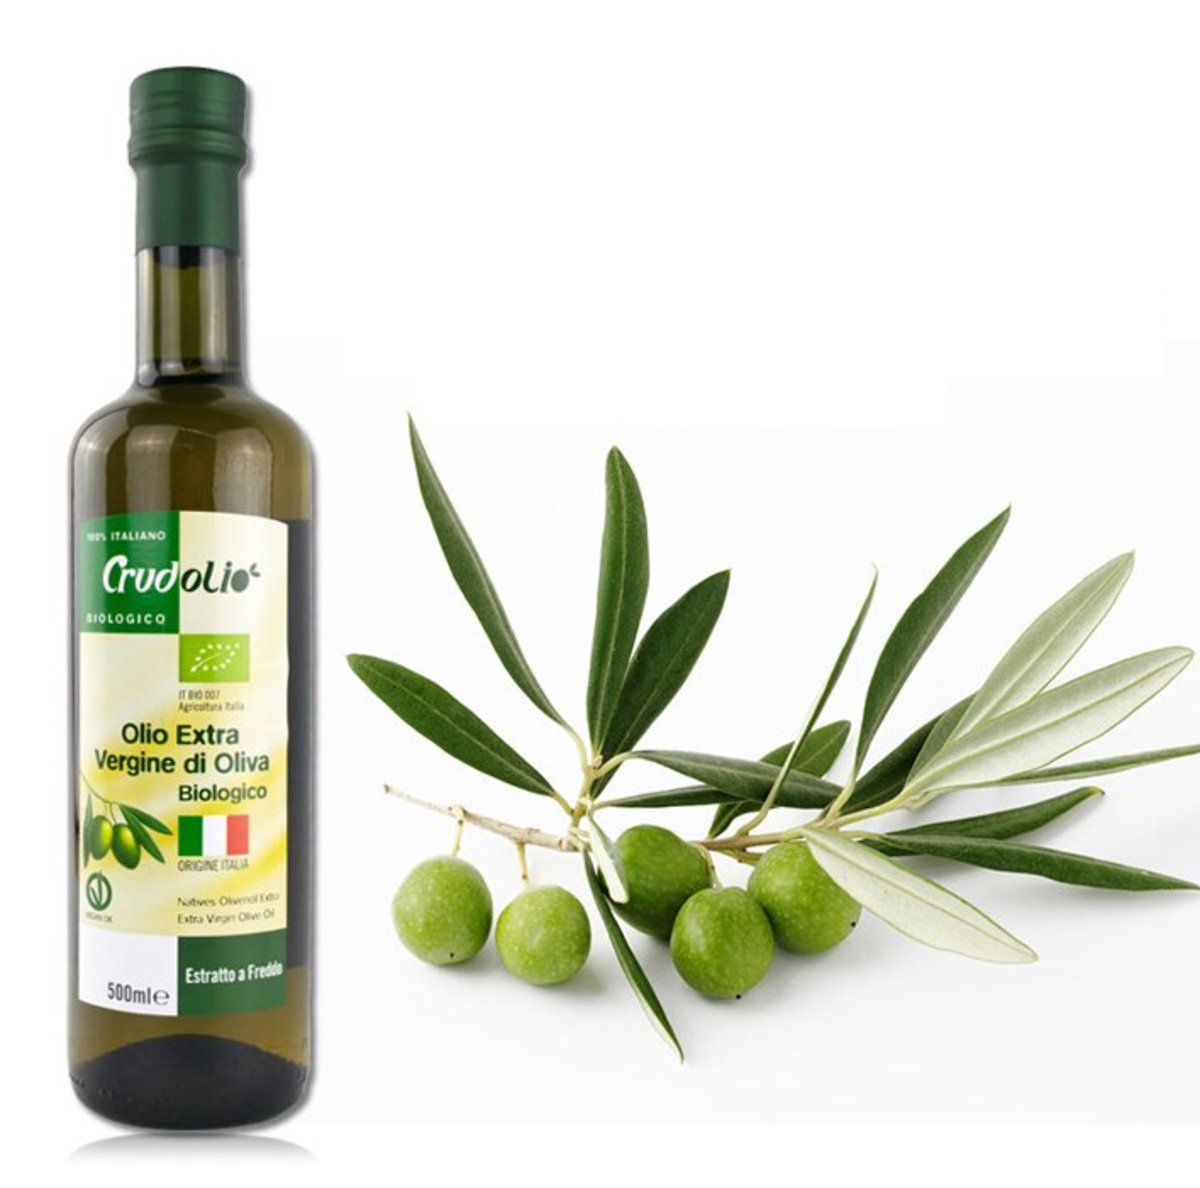 100% Italian Oil 意大利油 - Organic Italy Vegan Extra Virgin Olive Oil (500ml)